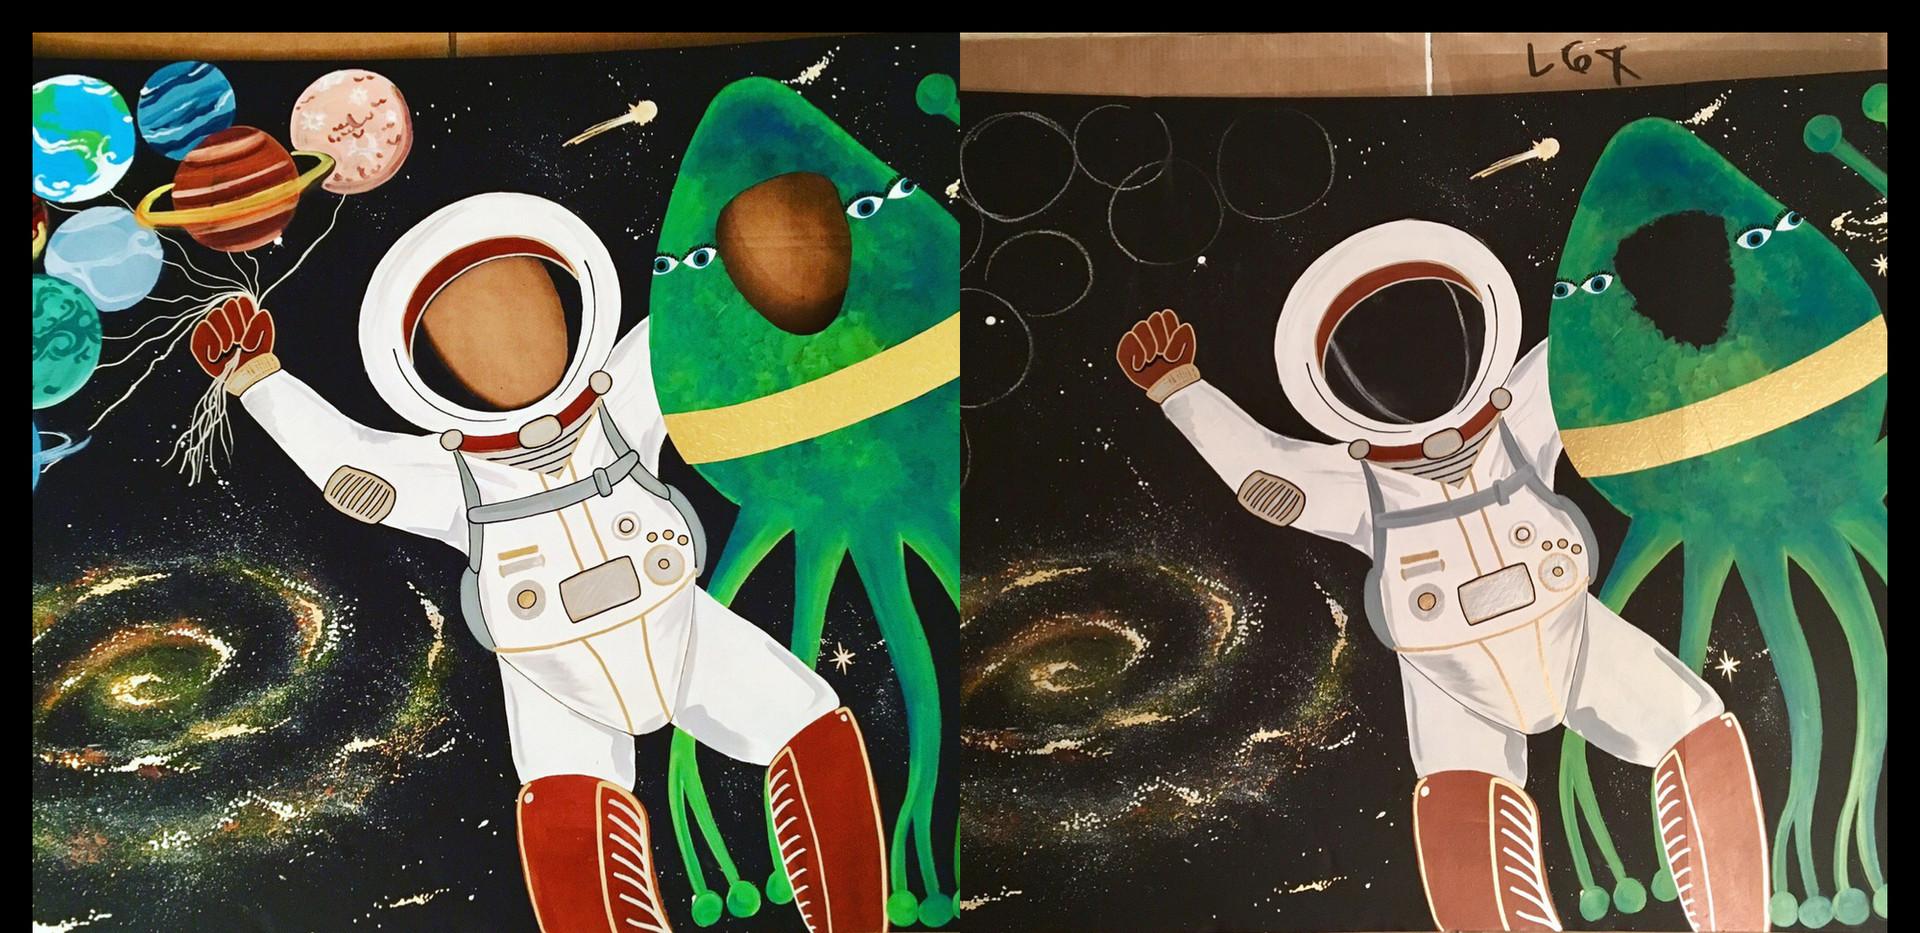 space-alien-hand-painted-fun-cutout-plan